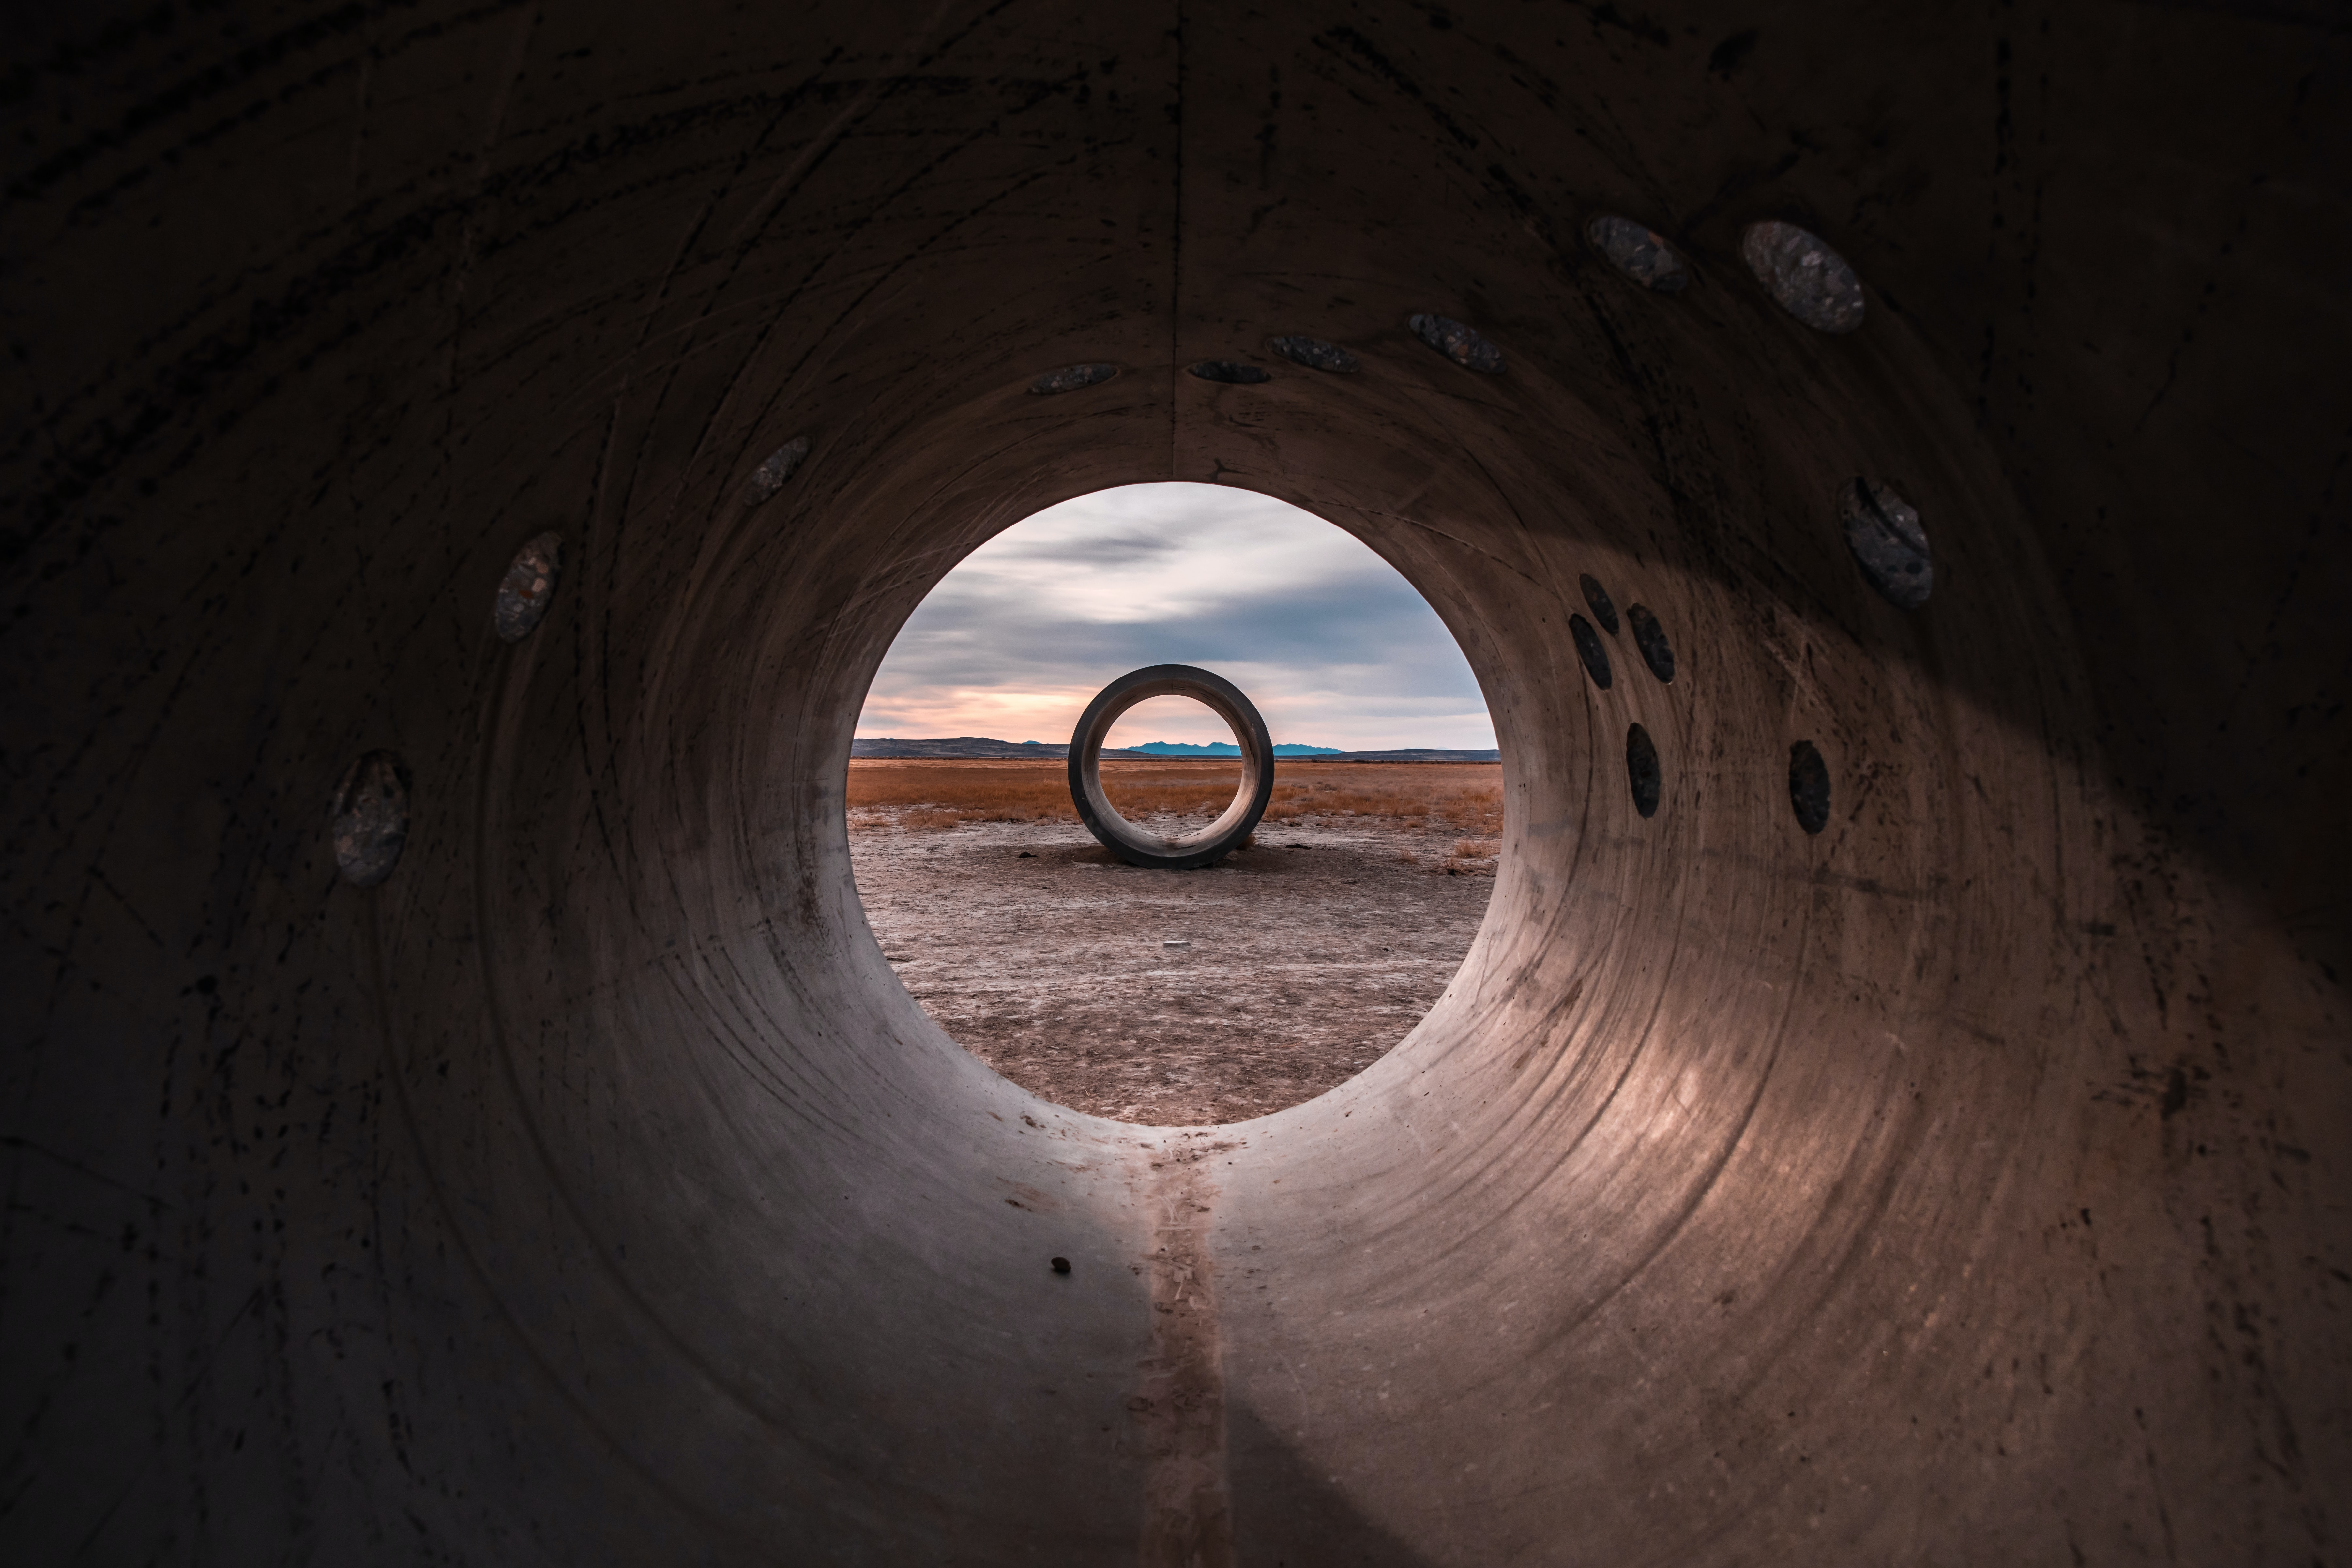 gray tunnels